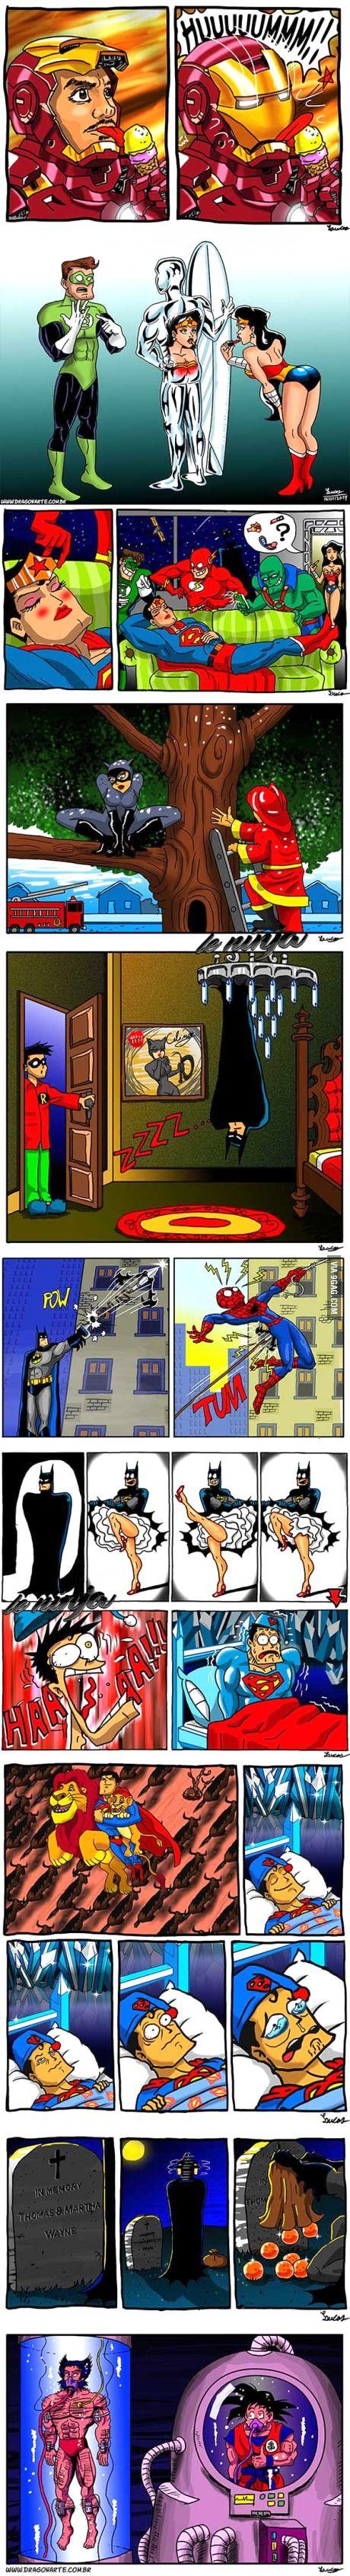 Super Heroes Fun Time Memes De Superheroes Heroe Humor Grafico